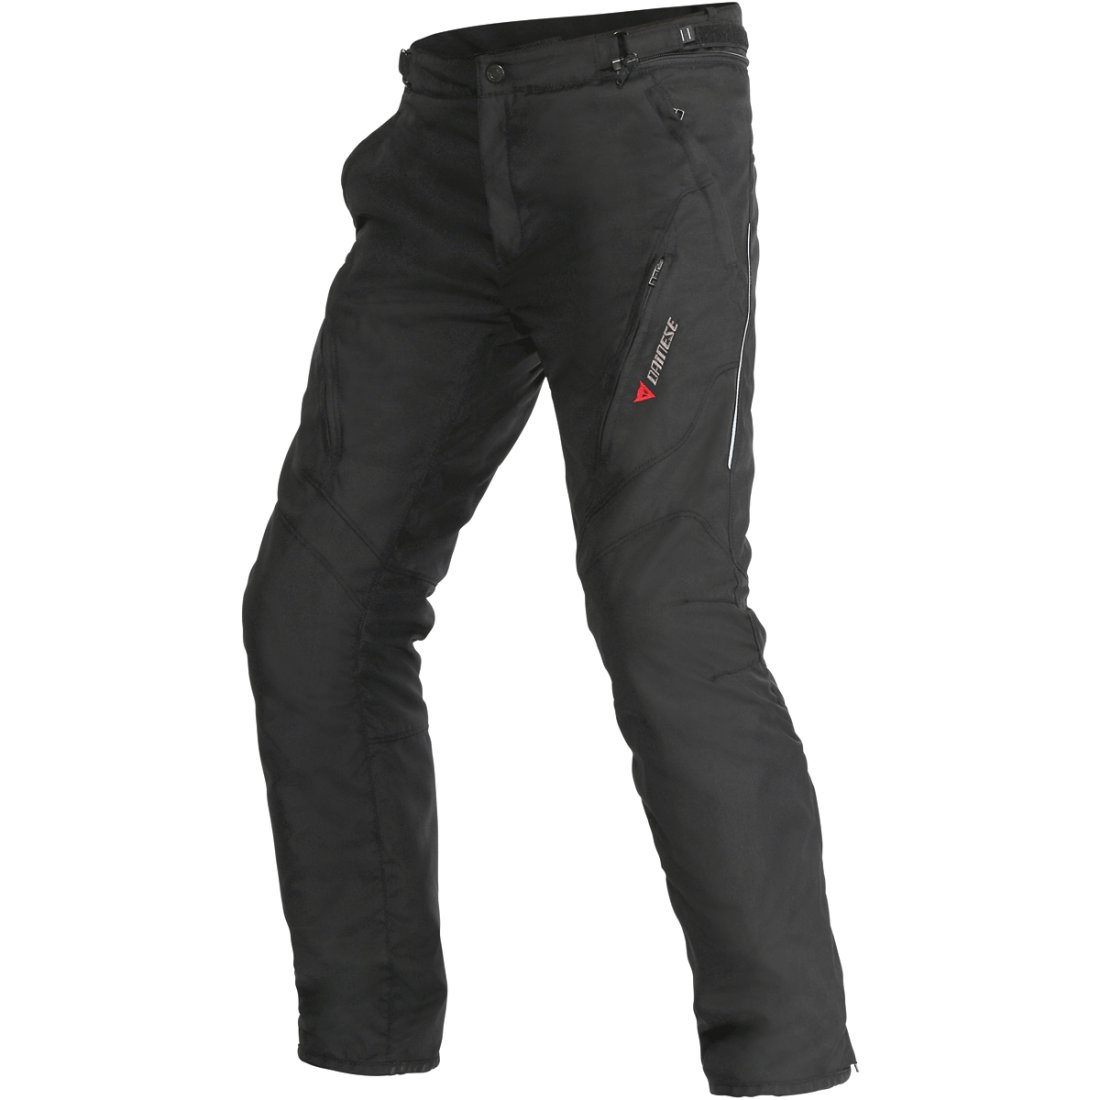 pantalon dainese tempest d dry black motocard. Black Bedroom Furniture Sets. Home Design Ideas